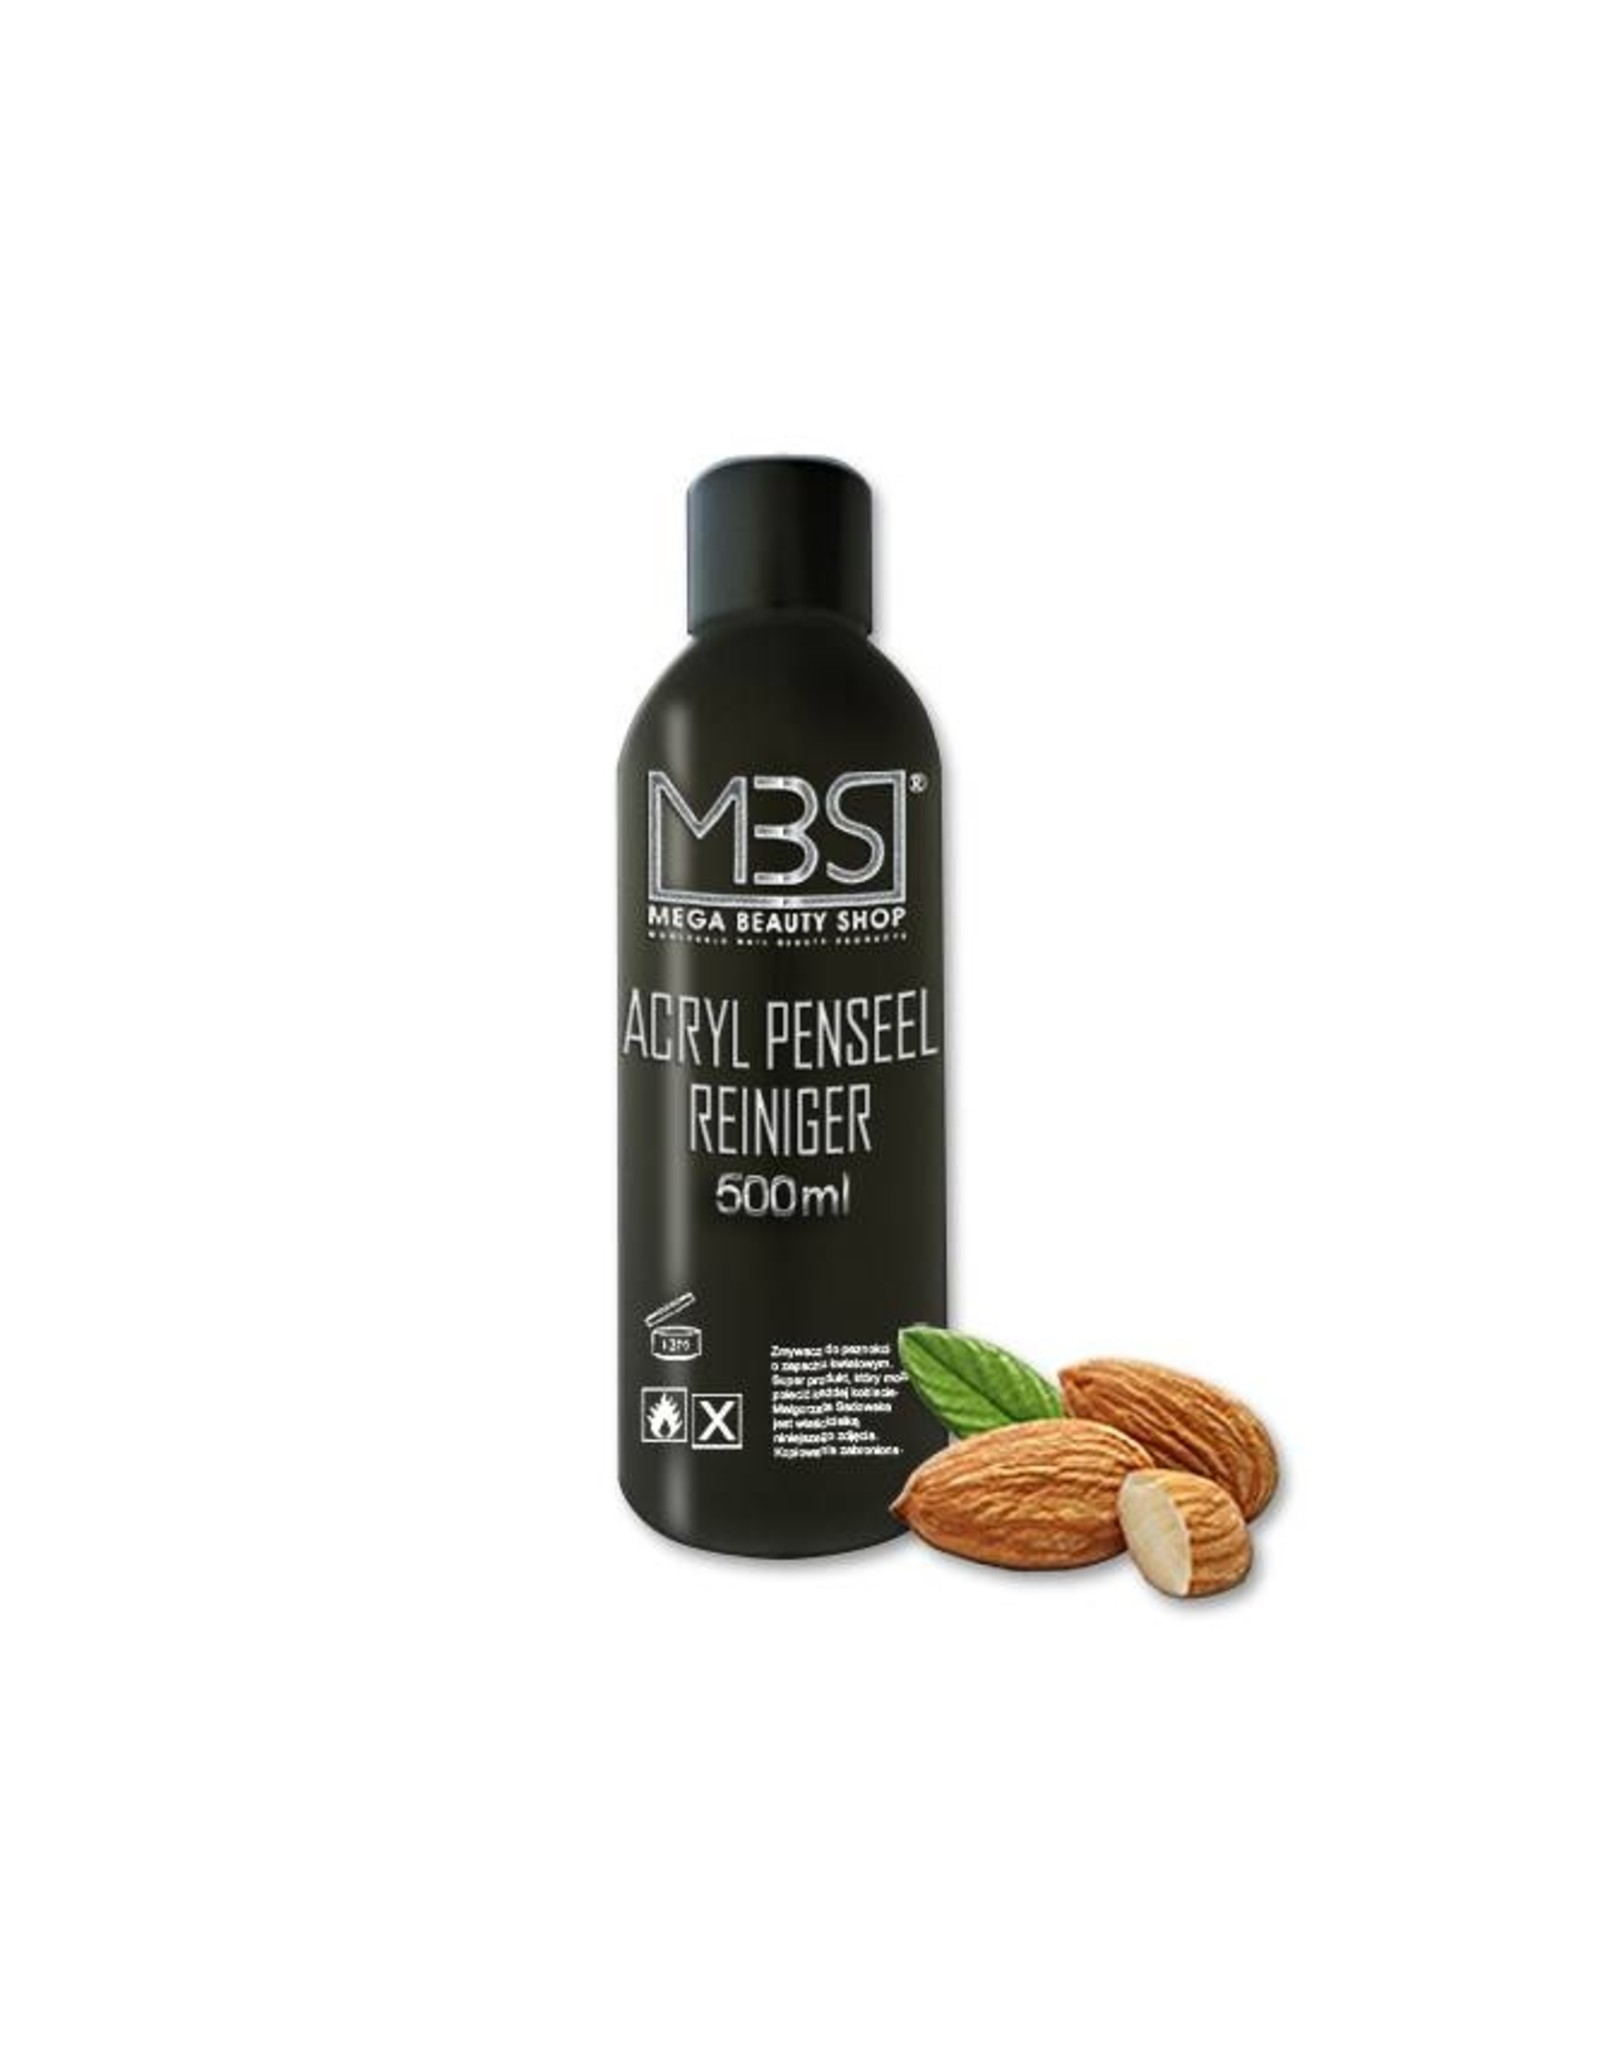 Mega Beauty Shop® Acryl penseelreiniger (500 ml)    met amandelgeur